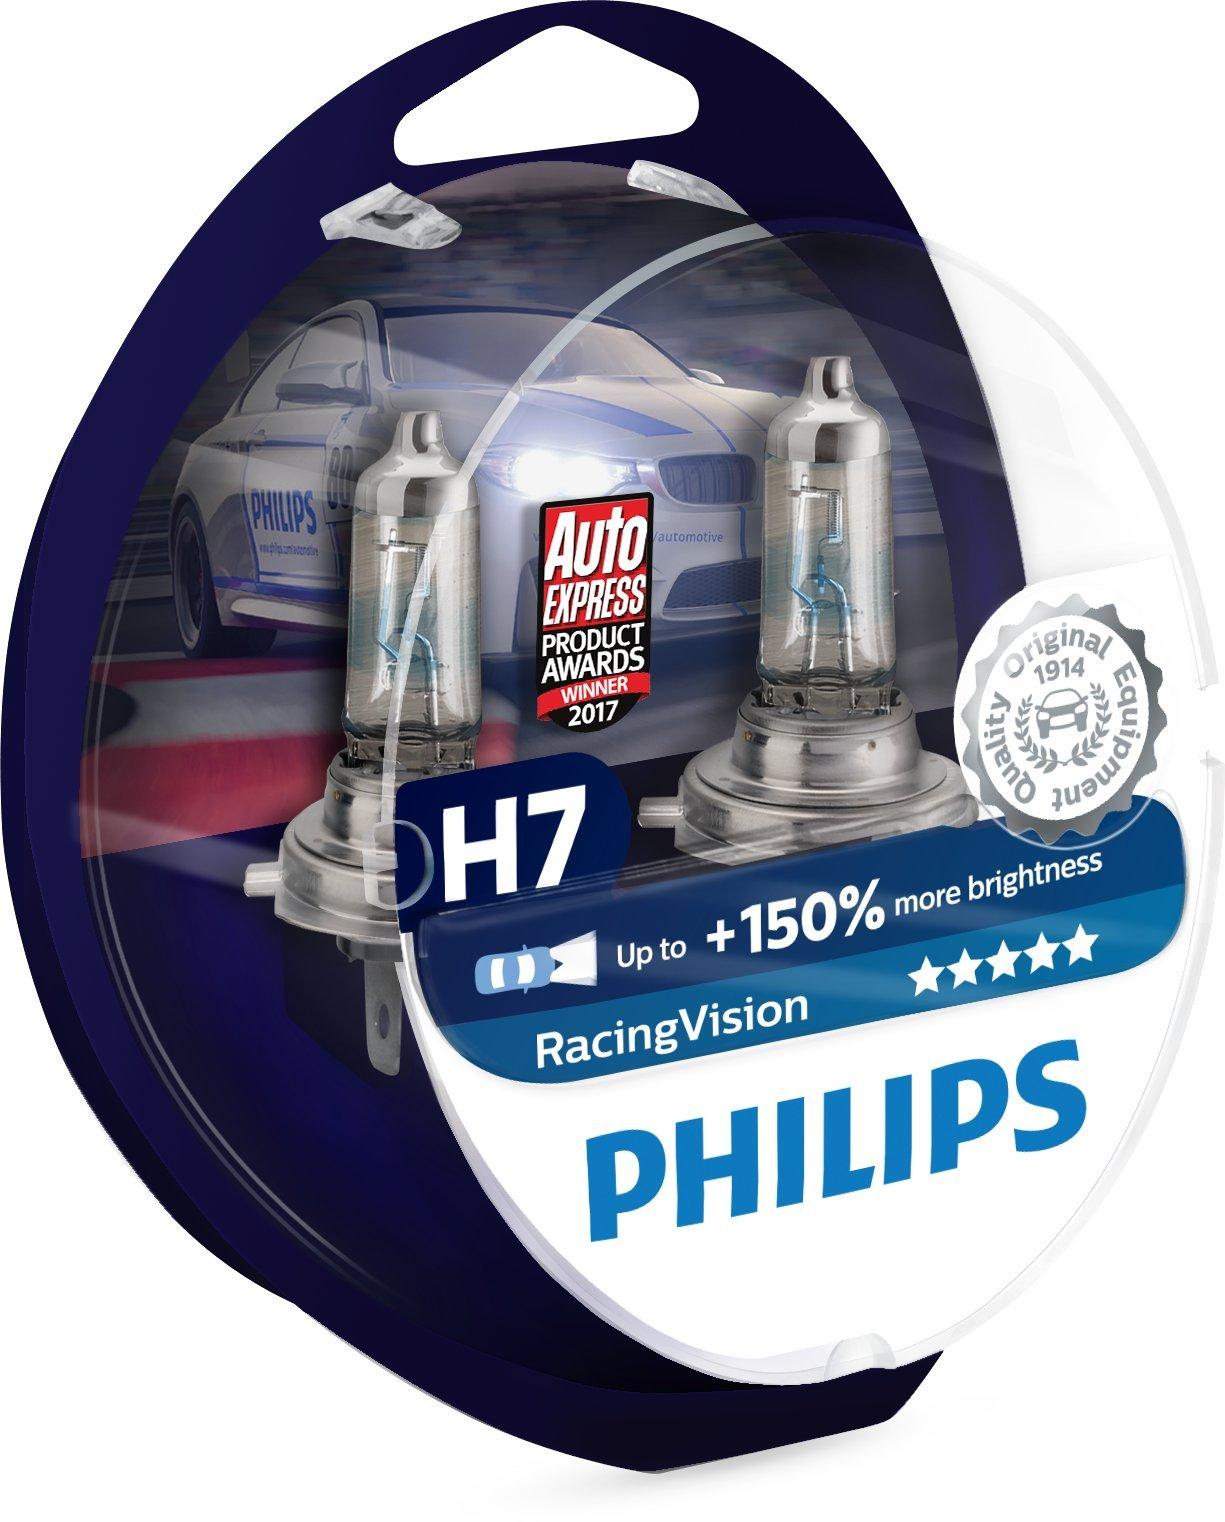 philips racingvision h7 headlight bulbs (twin) 12972rvs2 xtreme vision upgrade - 713DhPaaa6L - Philips RacingVision H7 Headlight Bulbs (Twin) 12972RVS2 Xtreme Vision Upgrade